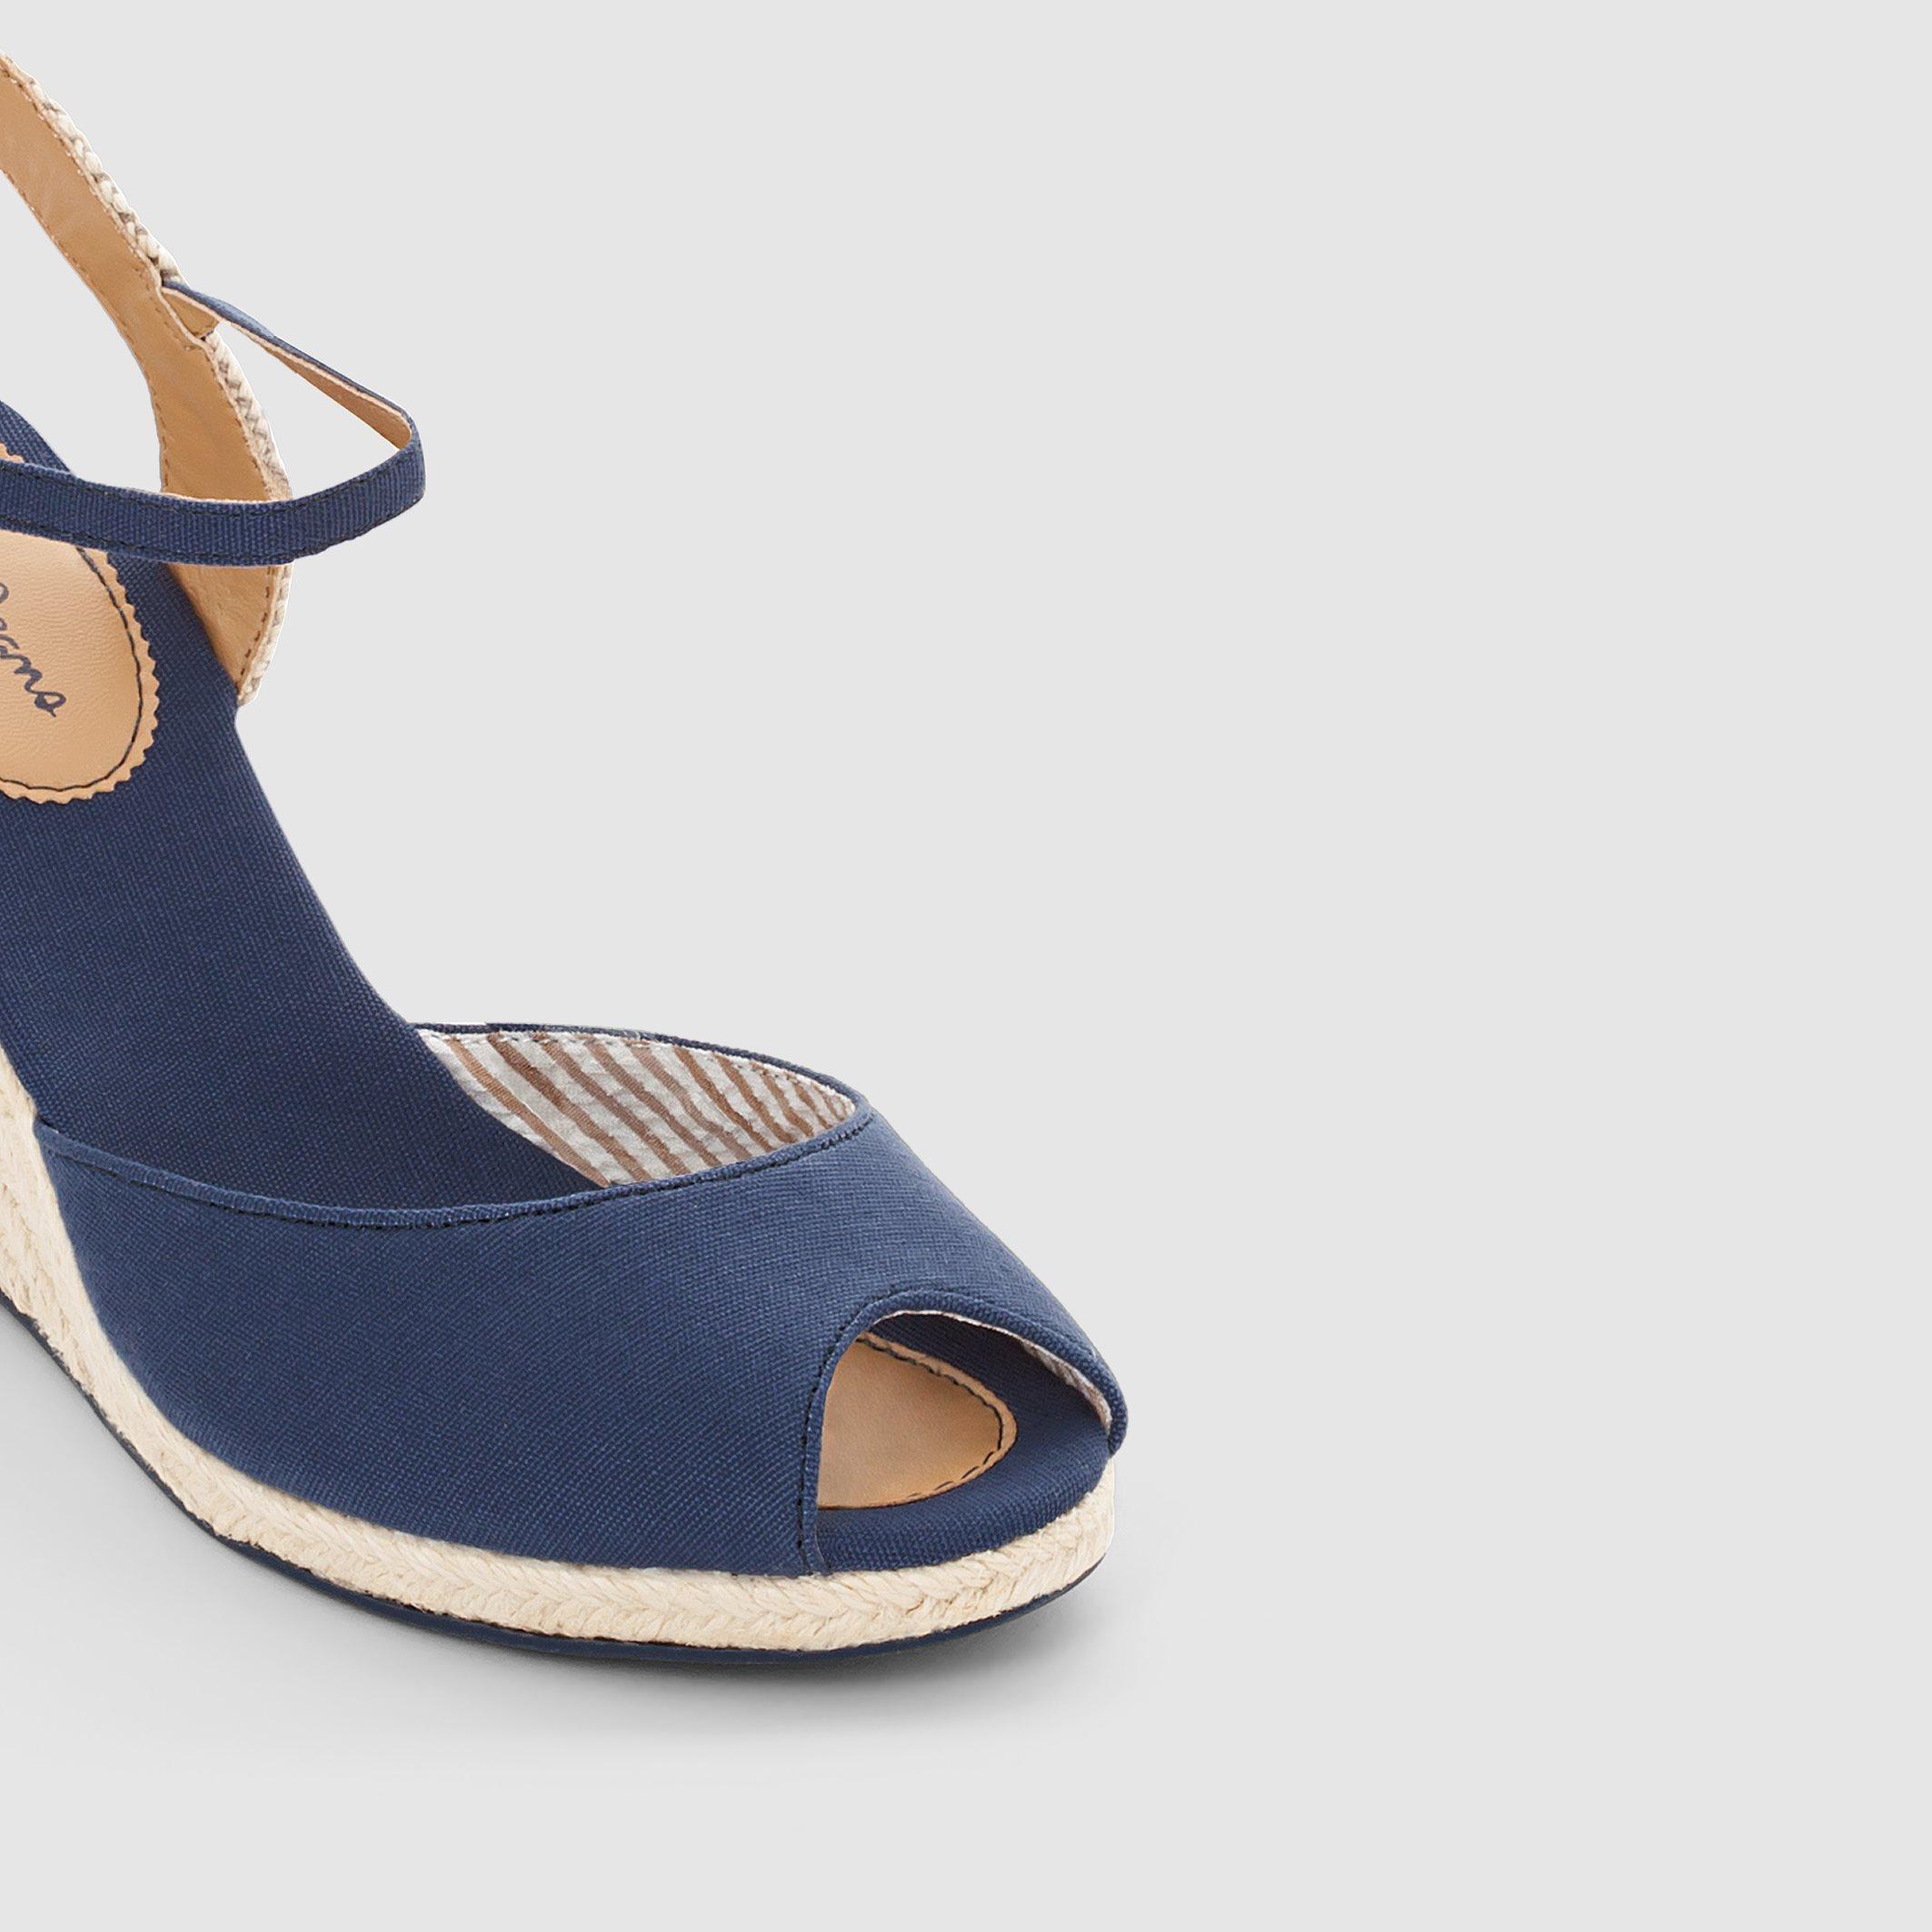 Pepe jeans Shark Fun Wedge Heel Sandals in Blue | Lyst